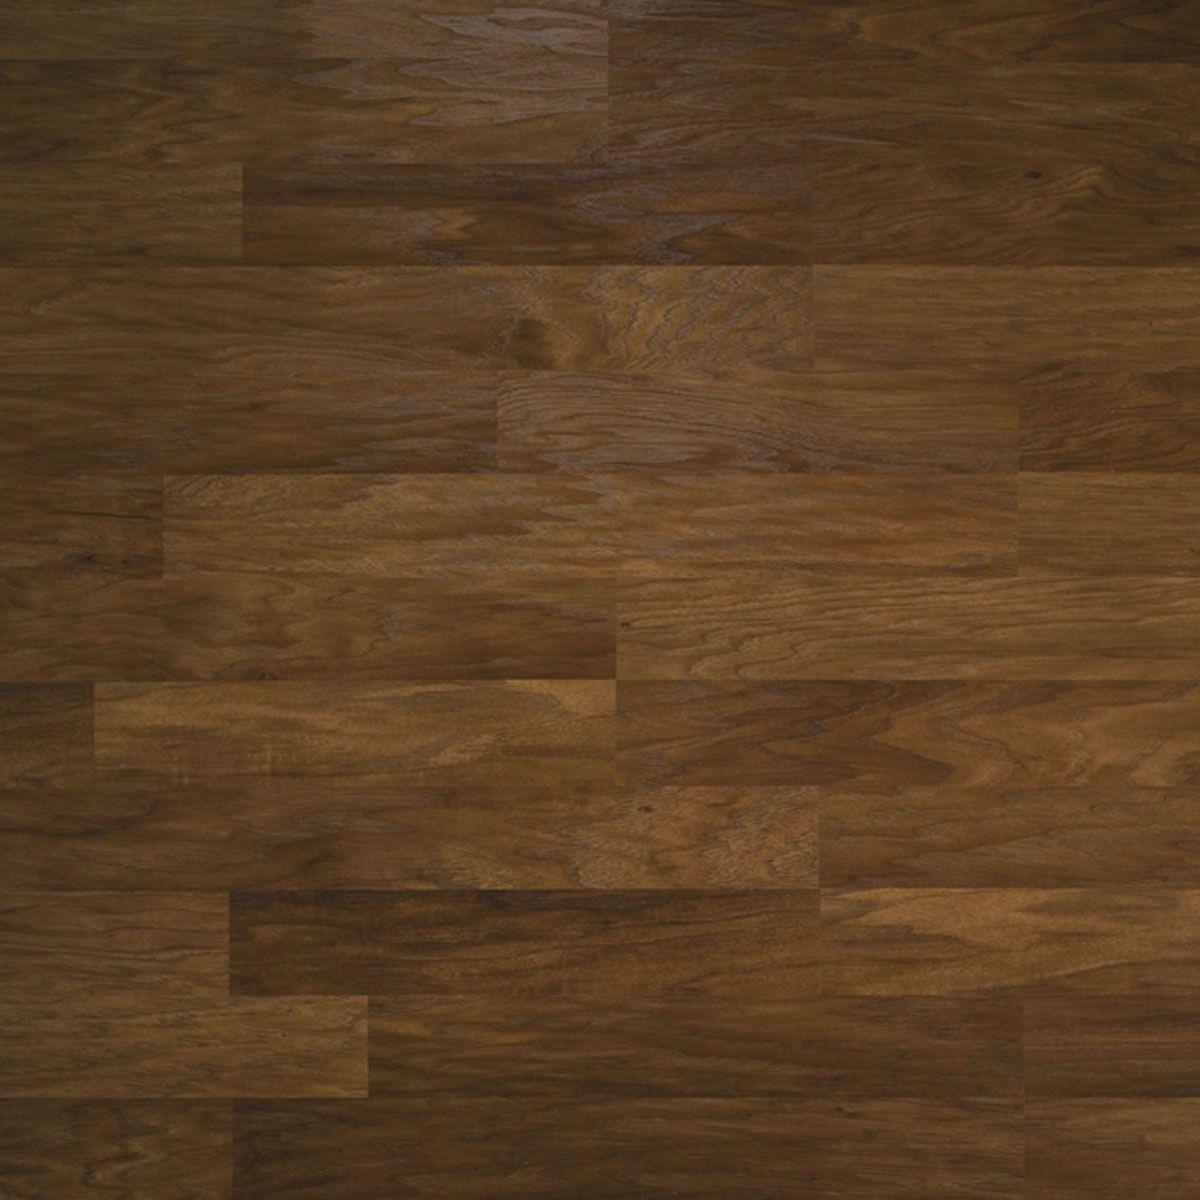 Textura de piso de madeira escura Sem emenda